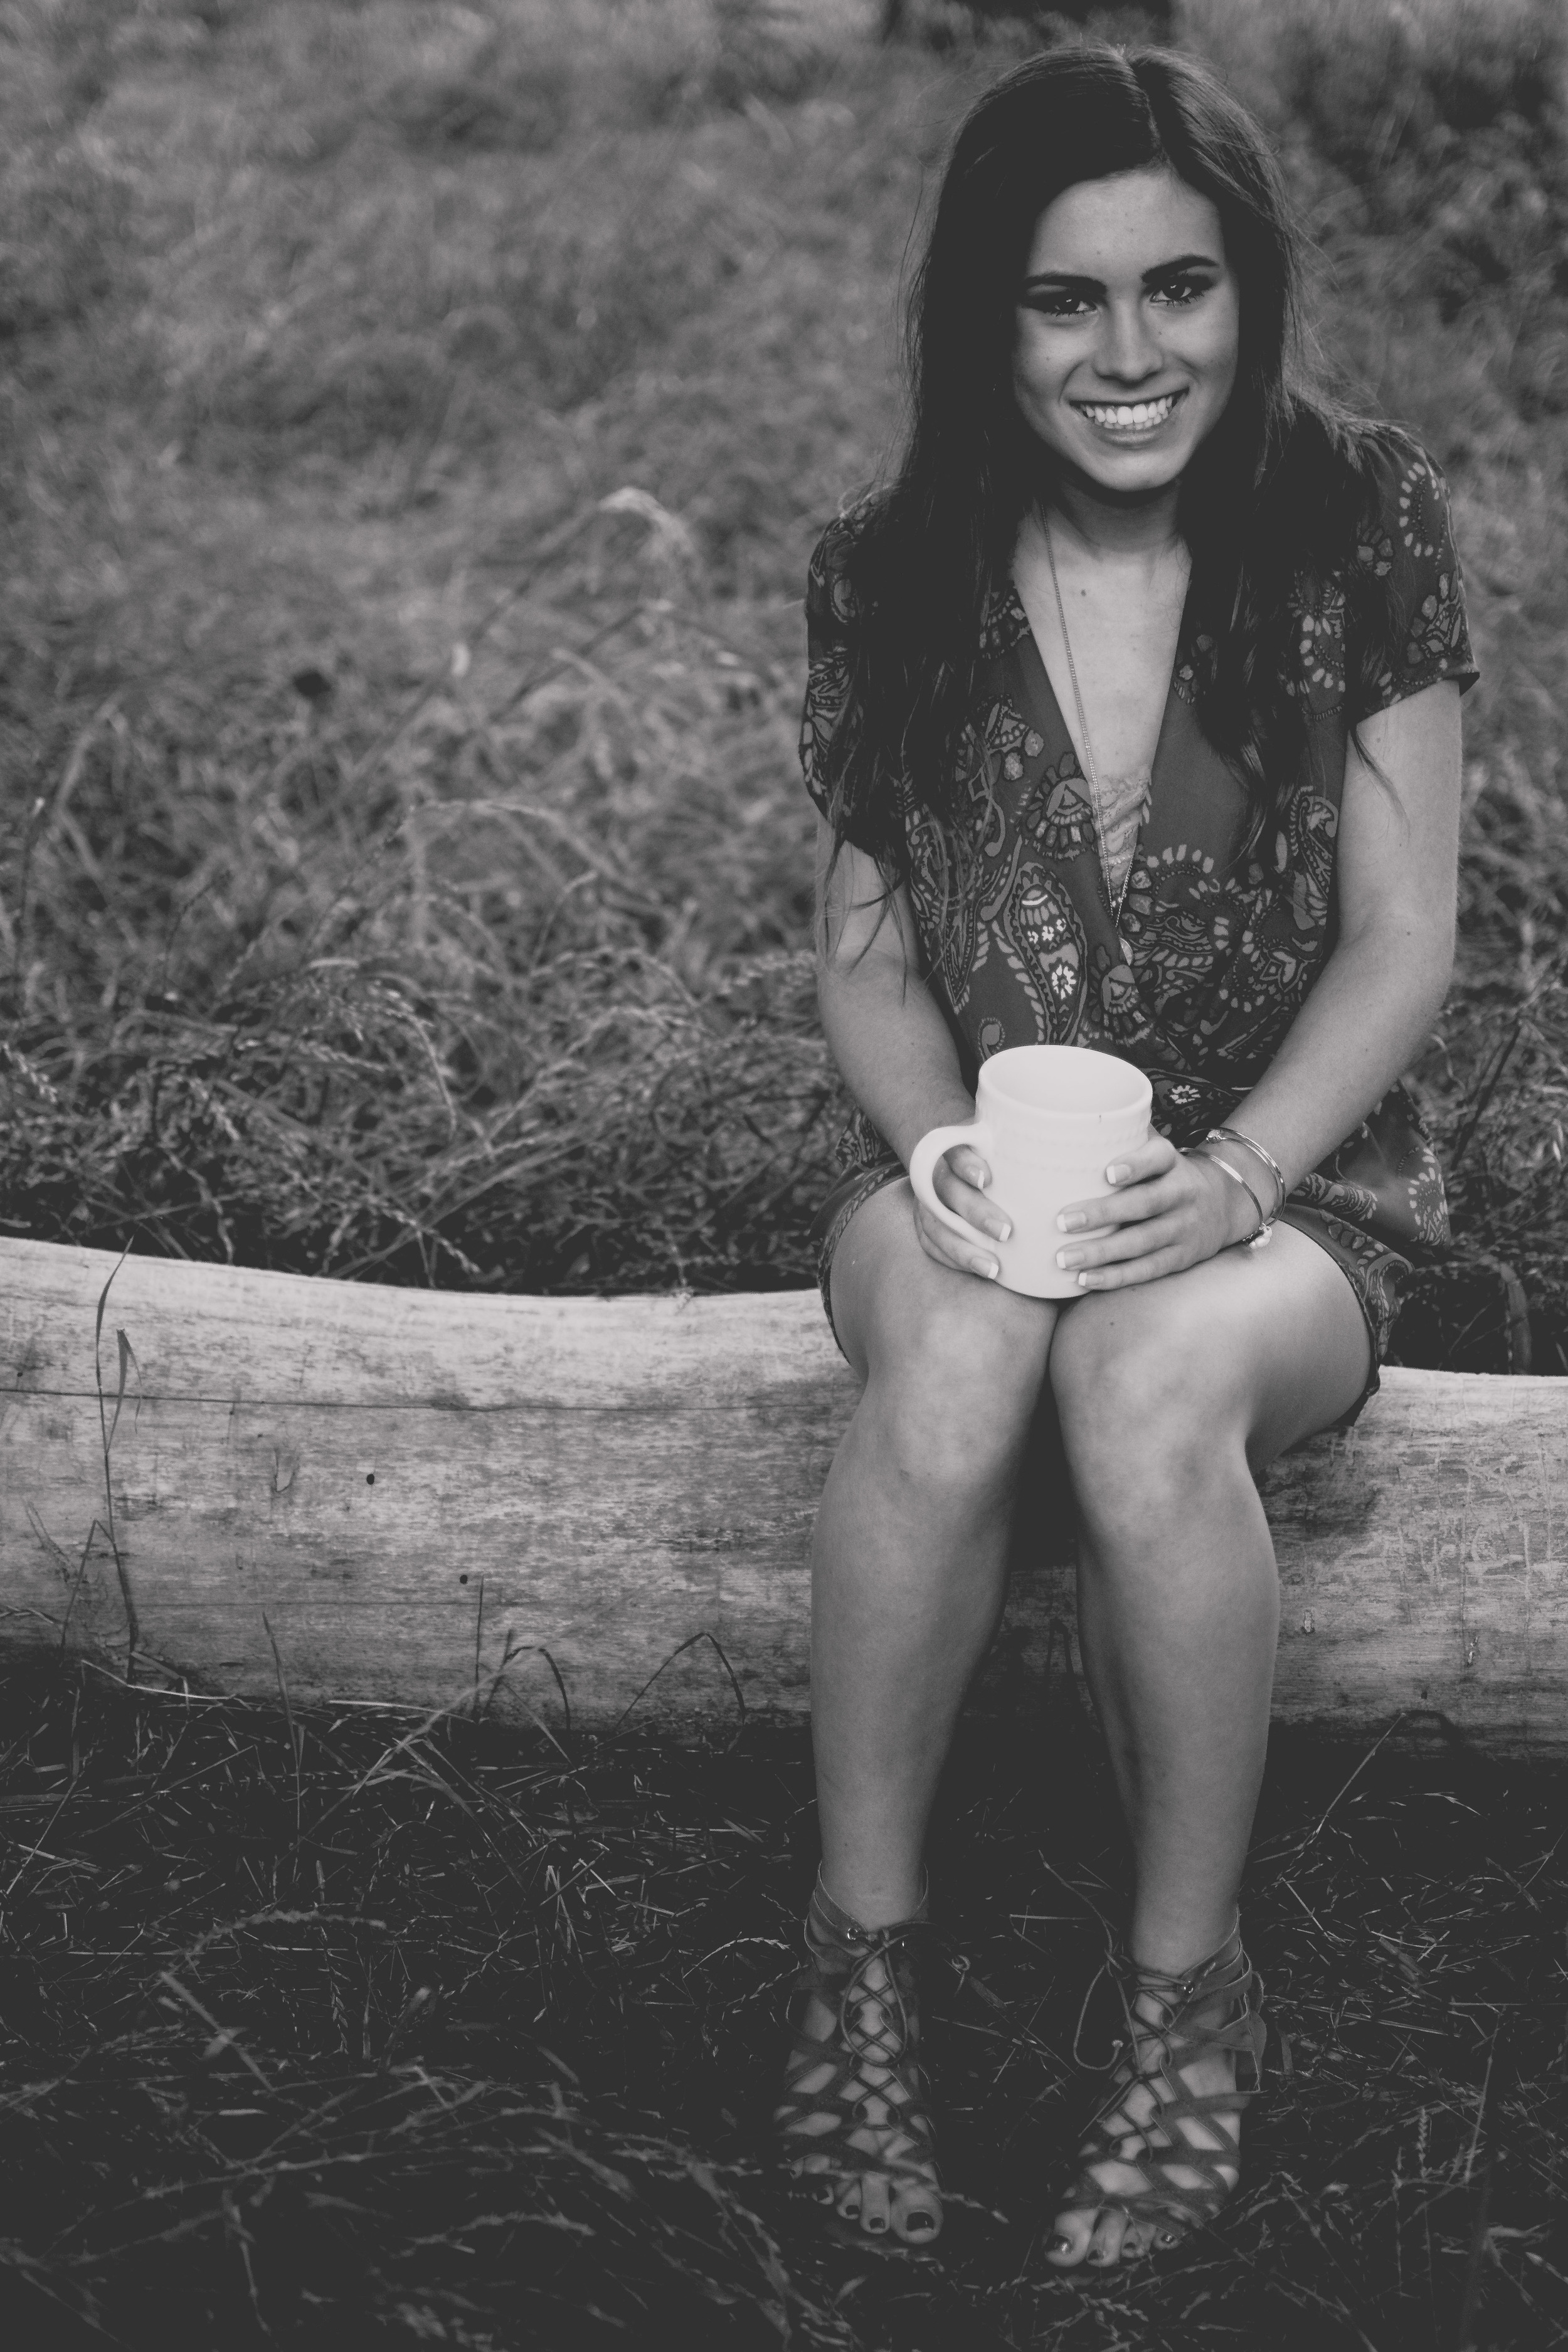 Landscape coffee photo